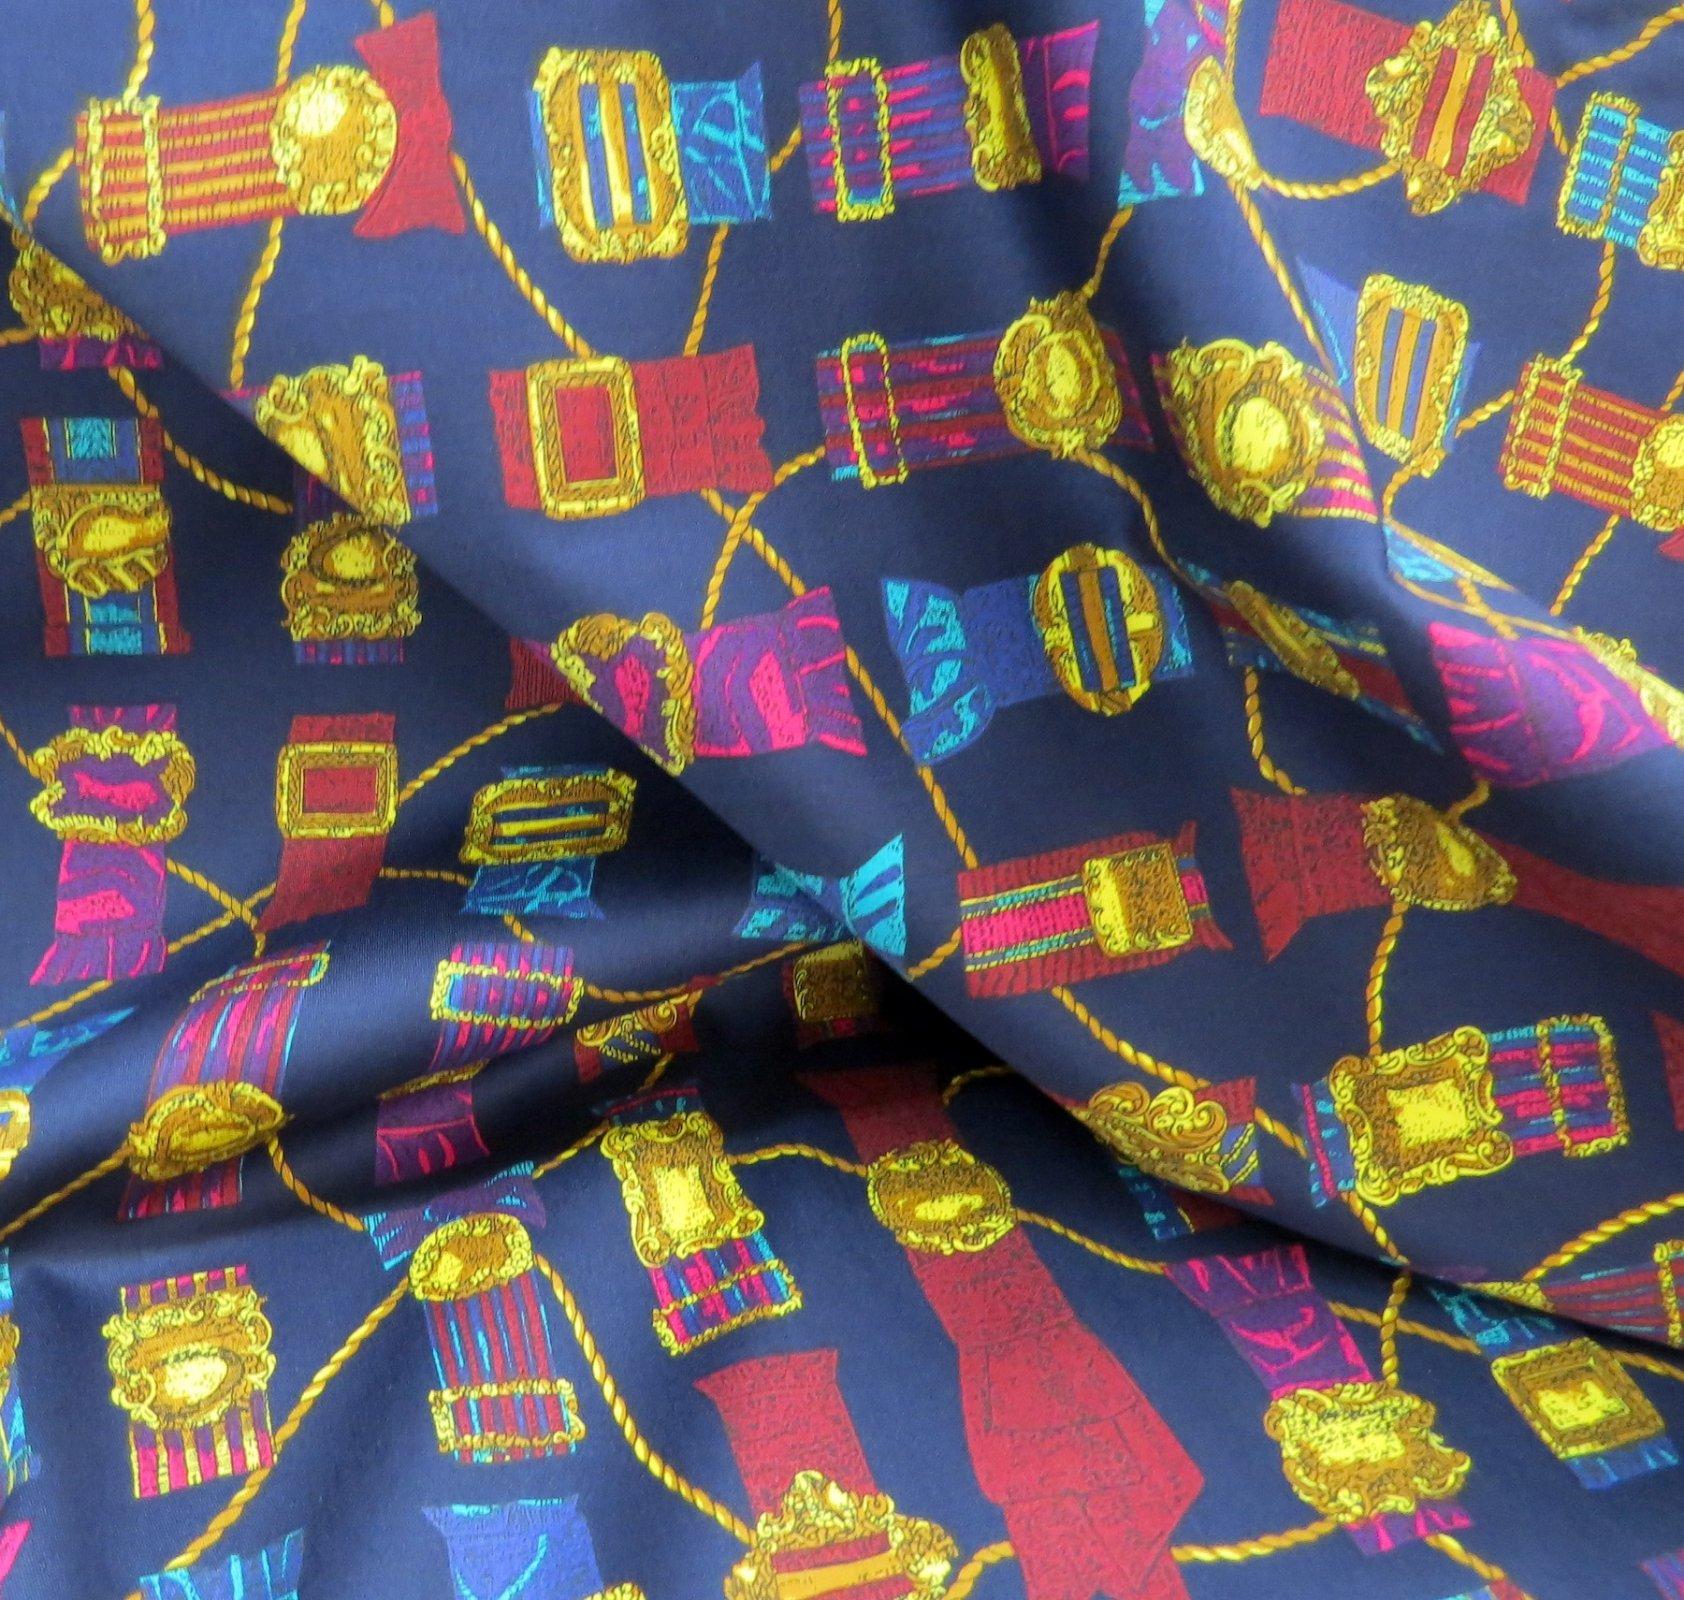 Belt Buckles Cotton Shirting